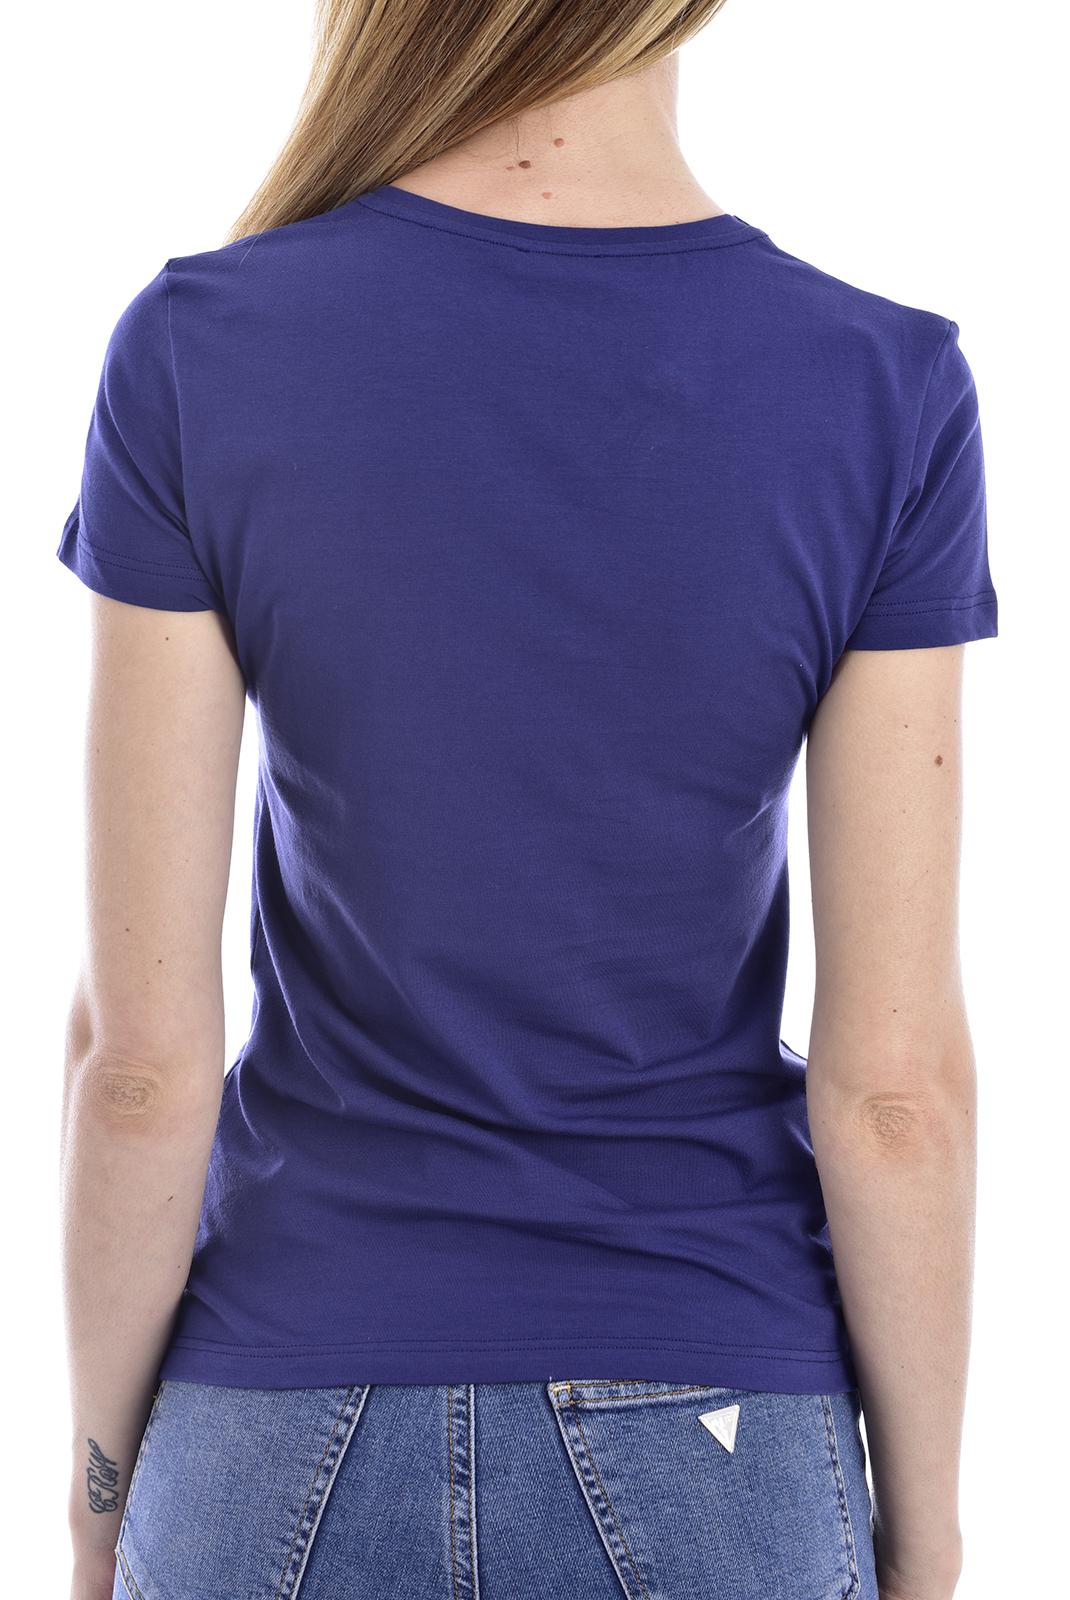 Tops & Tee shirts  Emporio armani 163321 0P317 15434 BLU INDACO